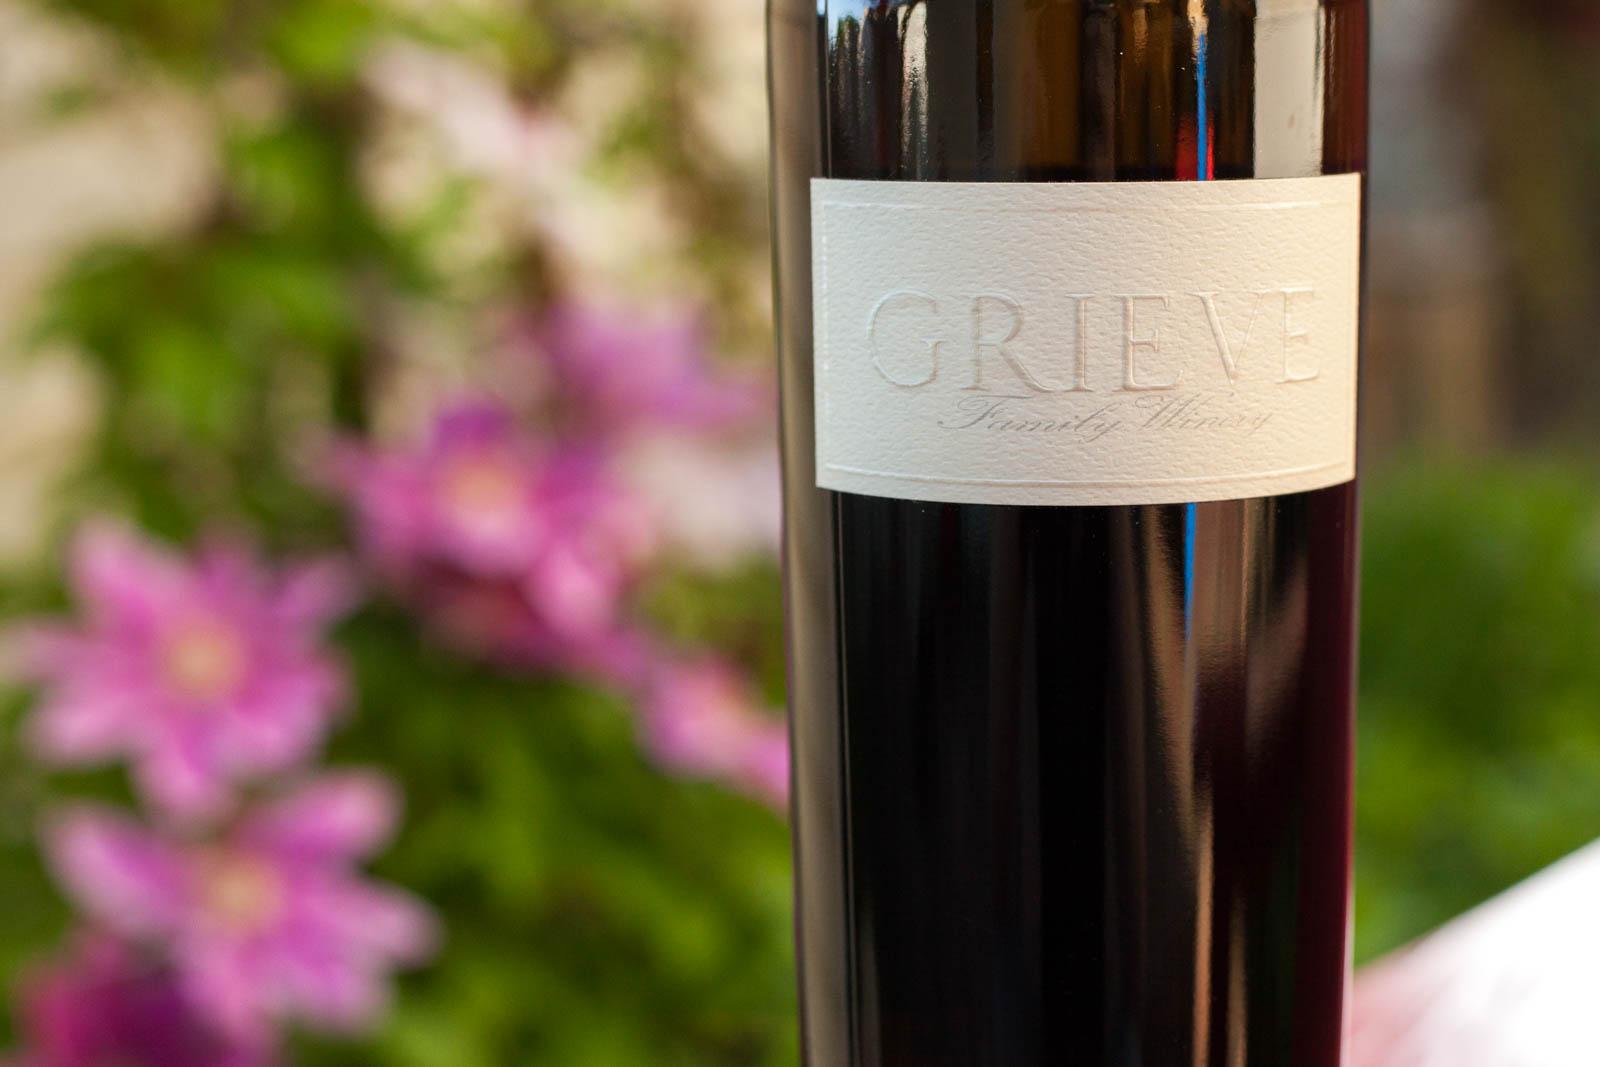 2014 Grieve Family Wines Sauvignon Blanc